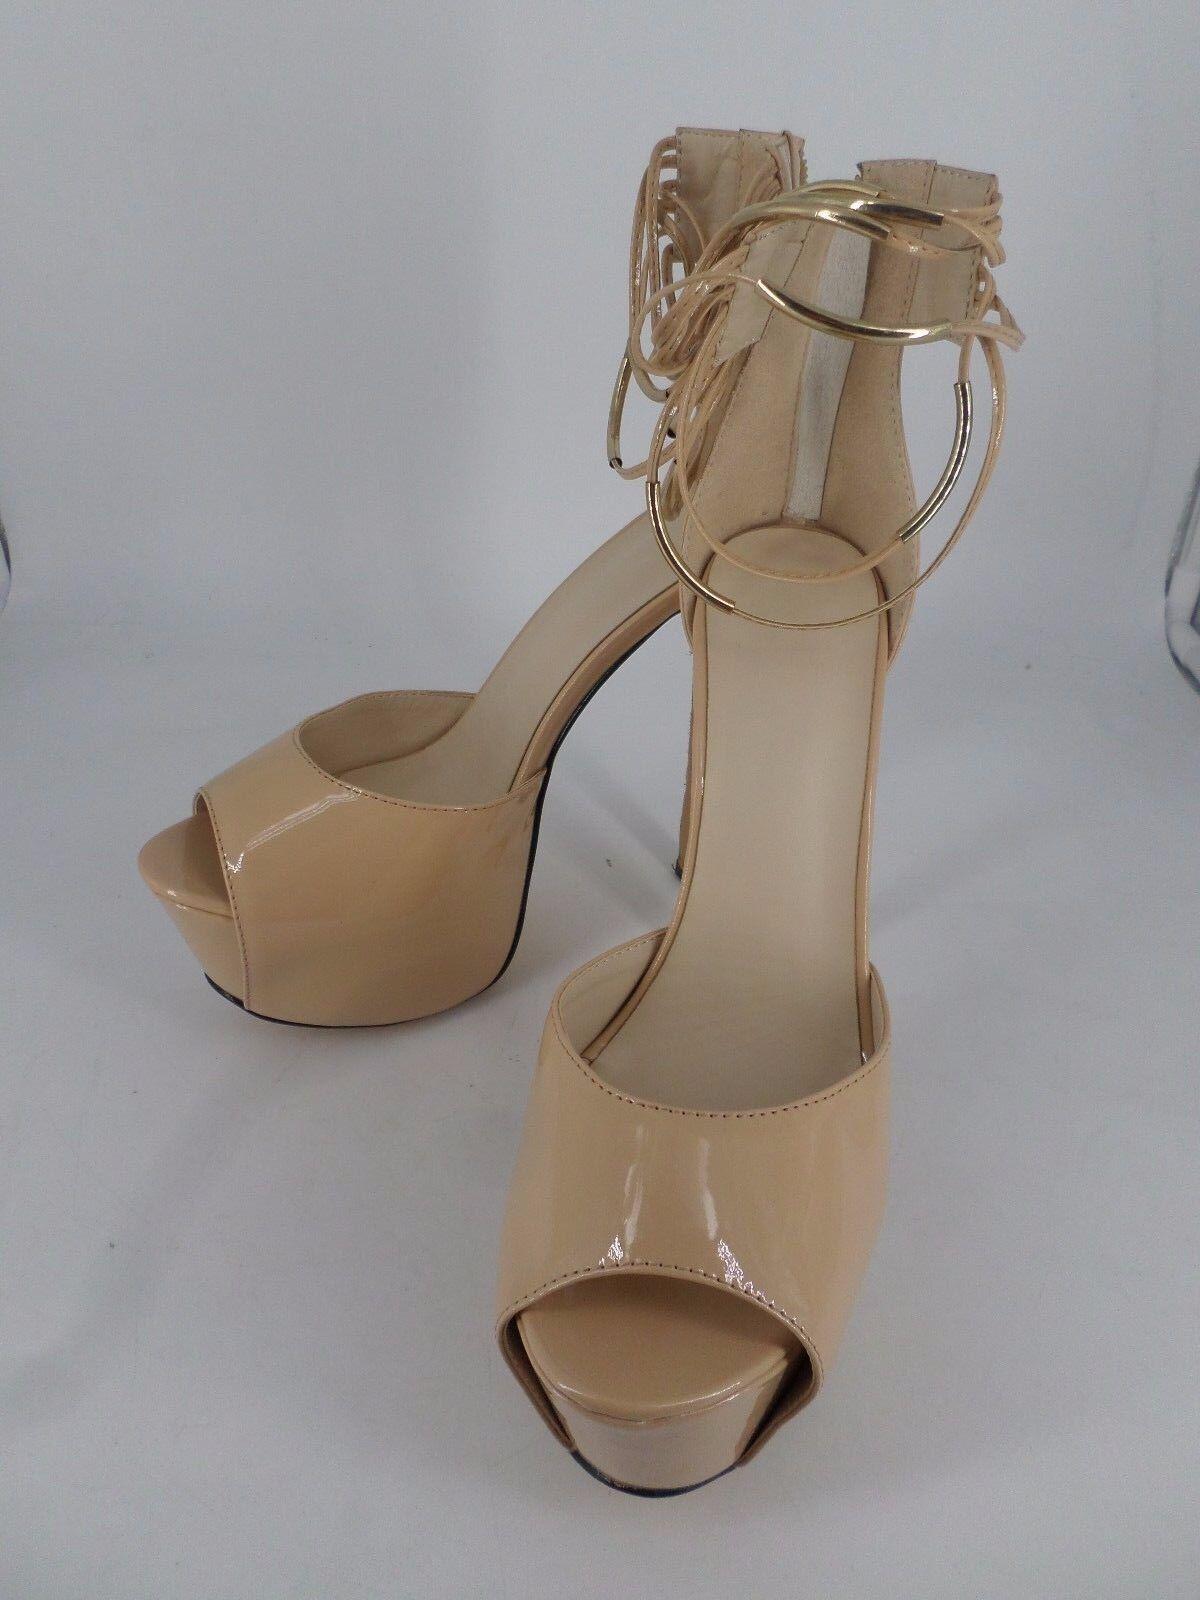 shoes Pie Apricot Platform Ankle Strap Peep Toe Heels UK 7 EU 41 LN27 32 SALEs